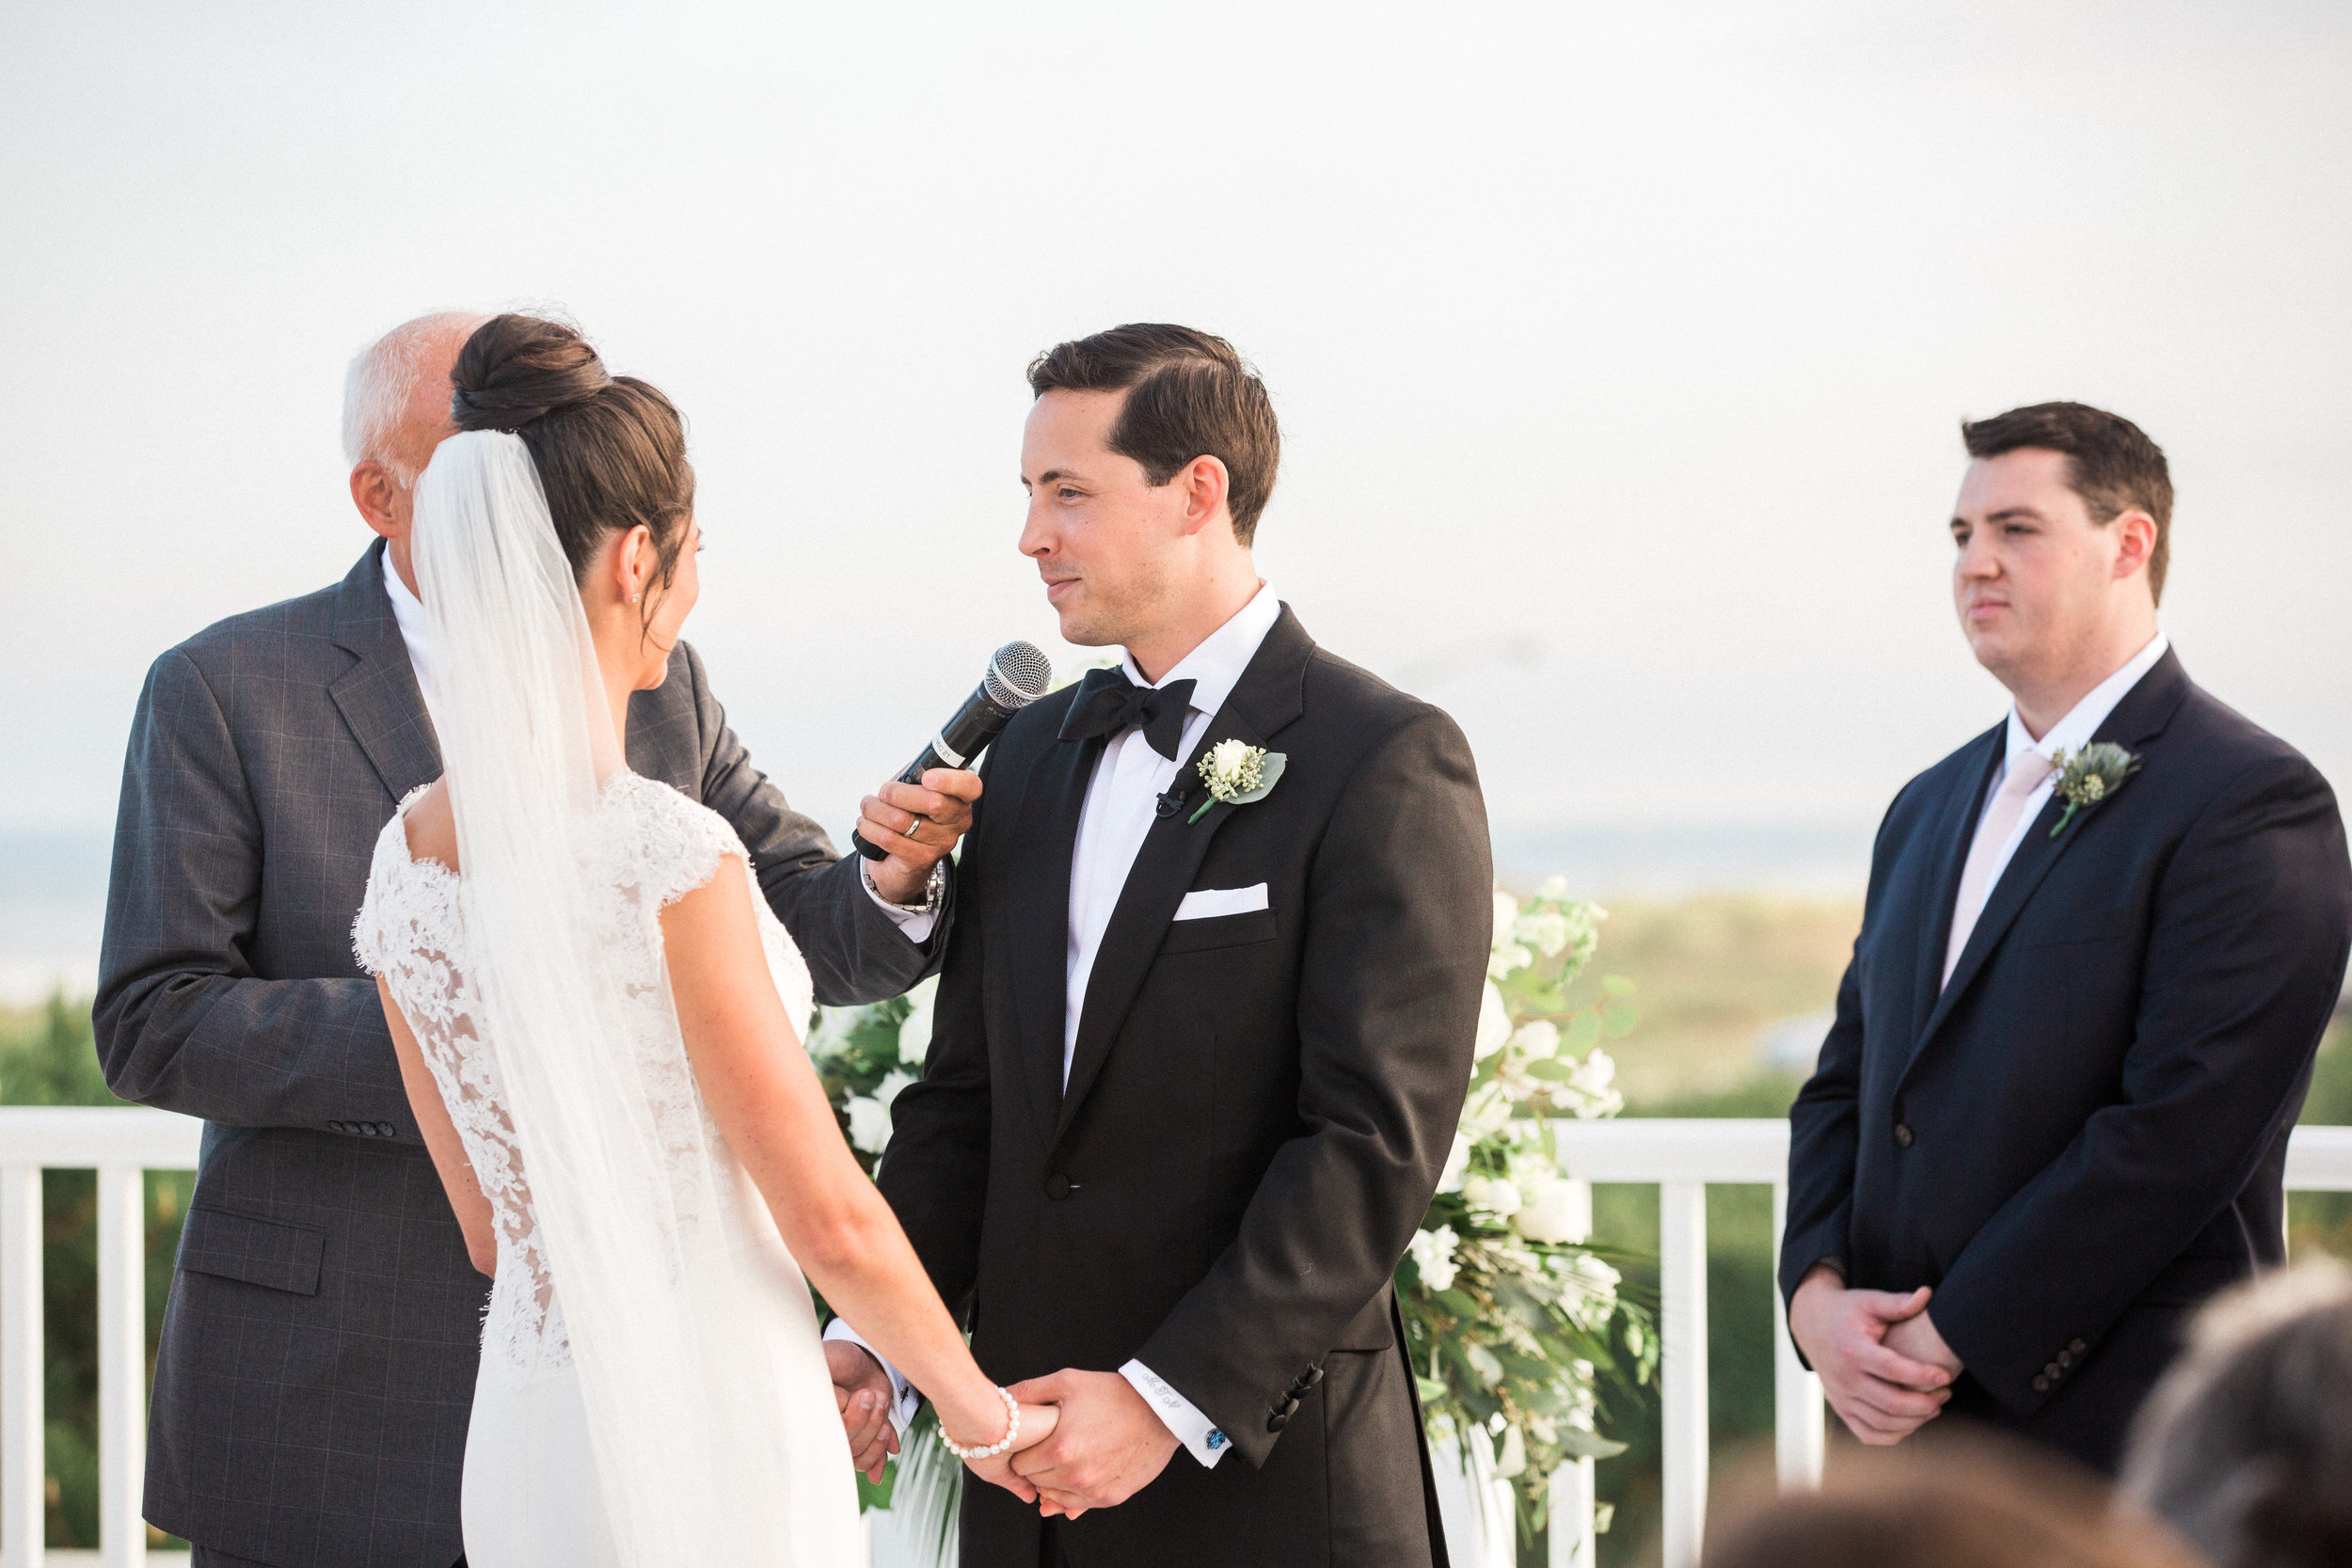 Spring-Lake-New-Jersey-Beach-Wedding-Photographer_269.jpg